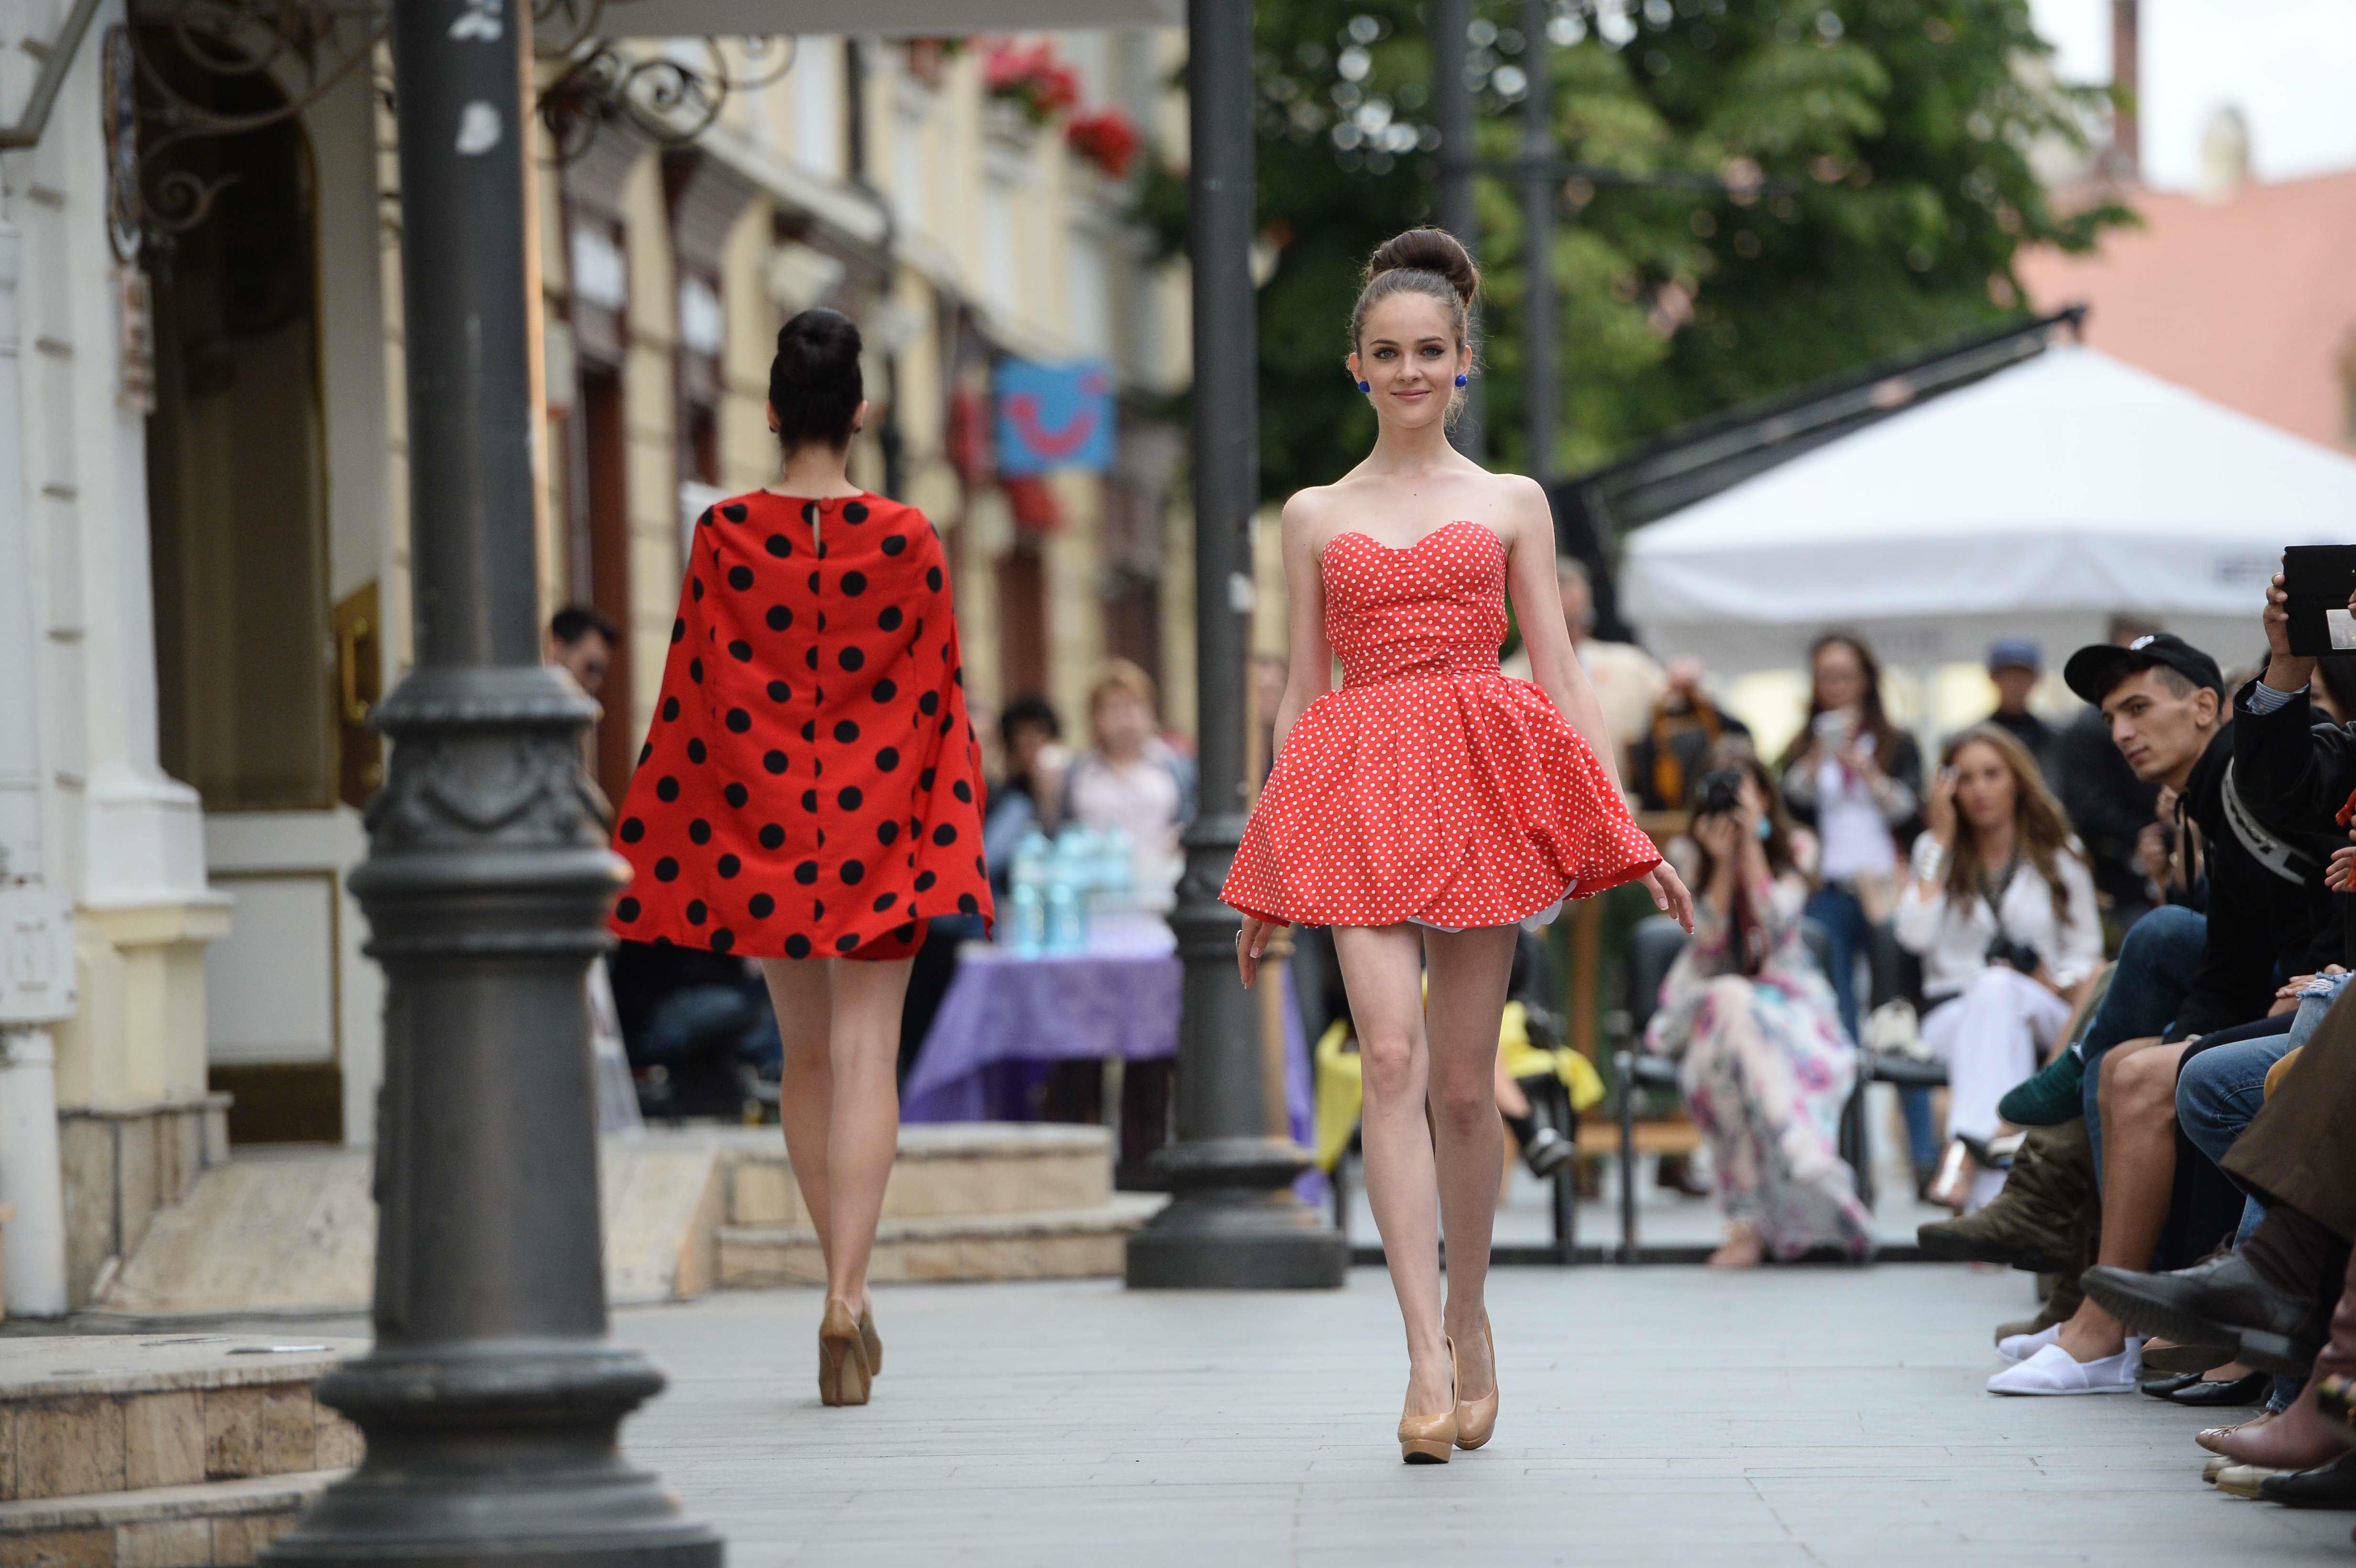 FFD2014_19iunie_Prezentare de moda Gabriela Atanasov-¬Seb astian Marcovici18062014 (2)